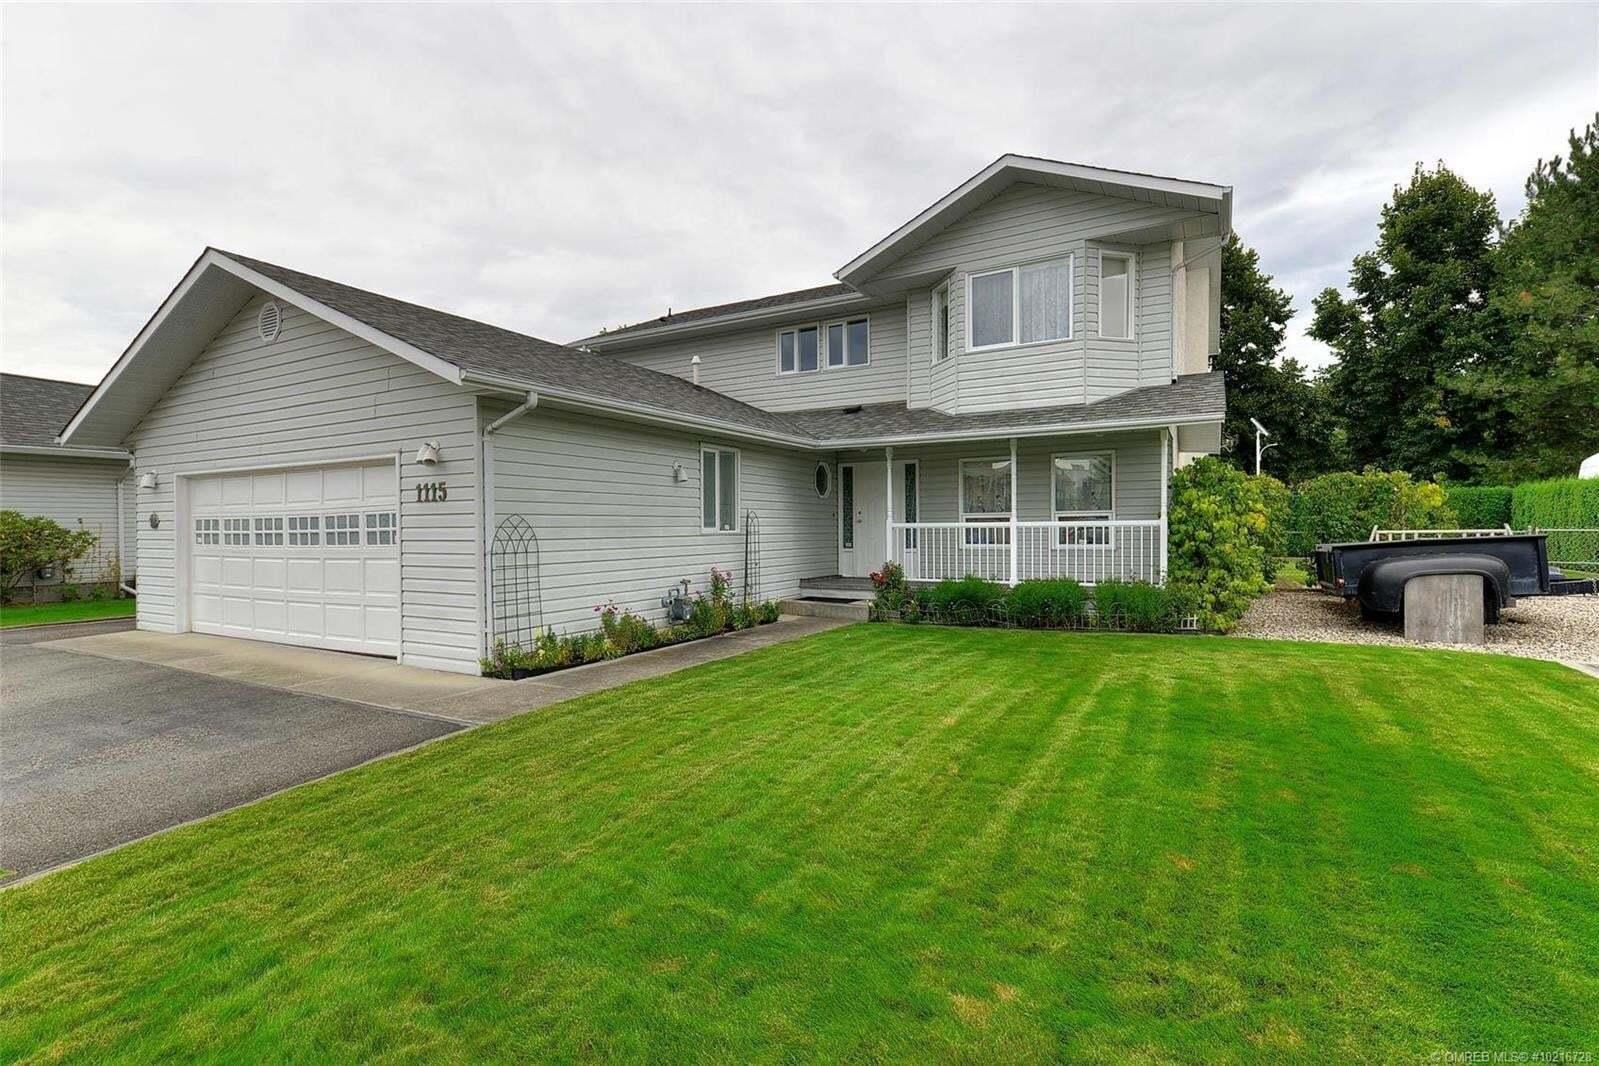 House for sale at 1115 Keyes Rd Kelowna British Columbia - MLS: 10216728